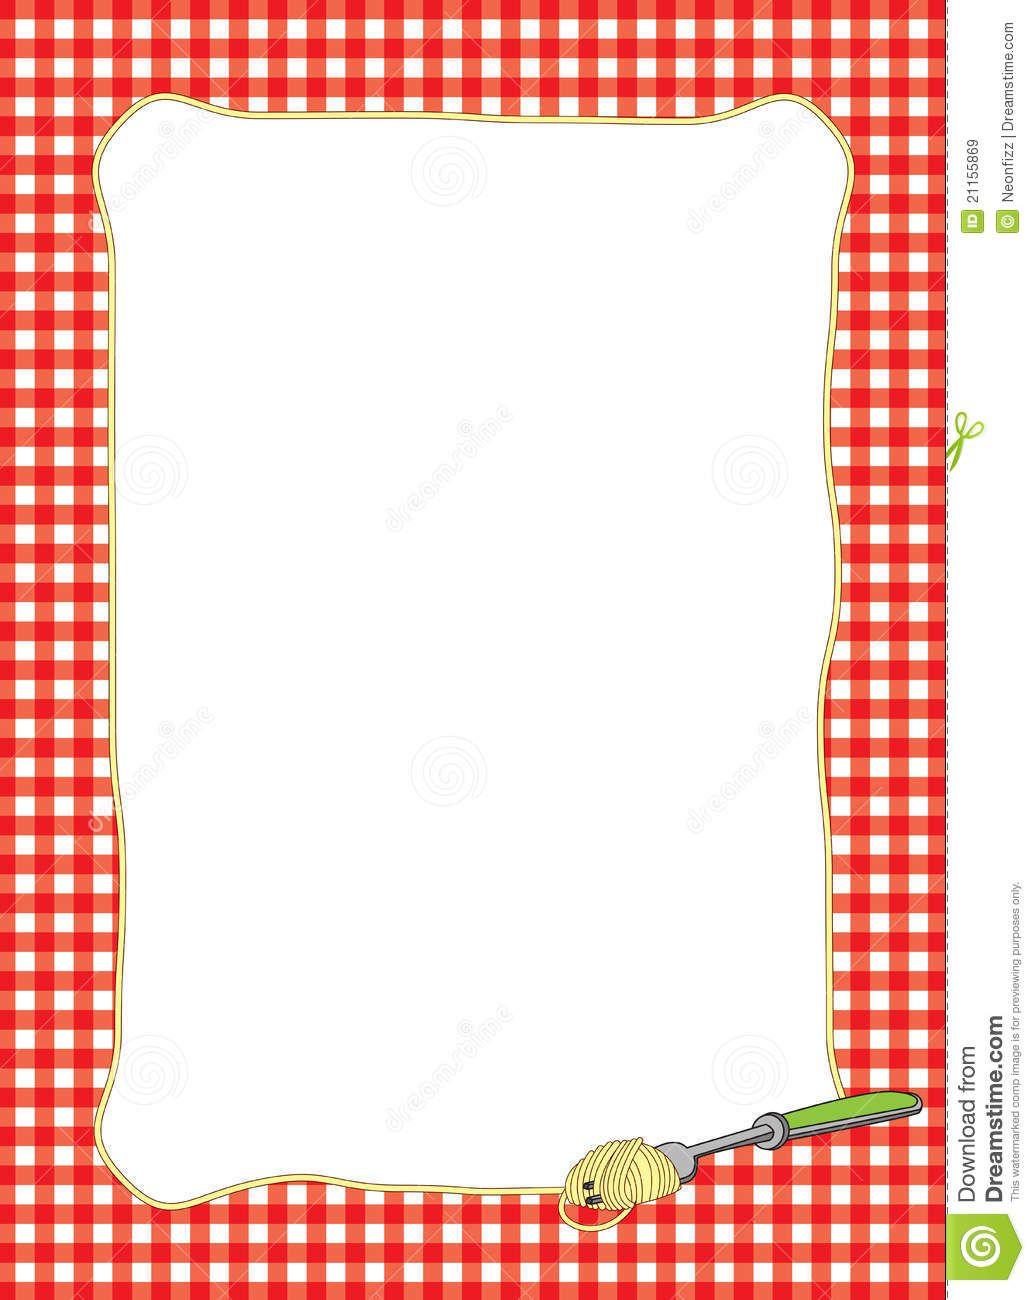 Spaghetti clipart borders royalty free Pin by Debra Dempsey on Scrapbook Cookbook | Italian recipes ... royalty free